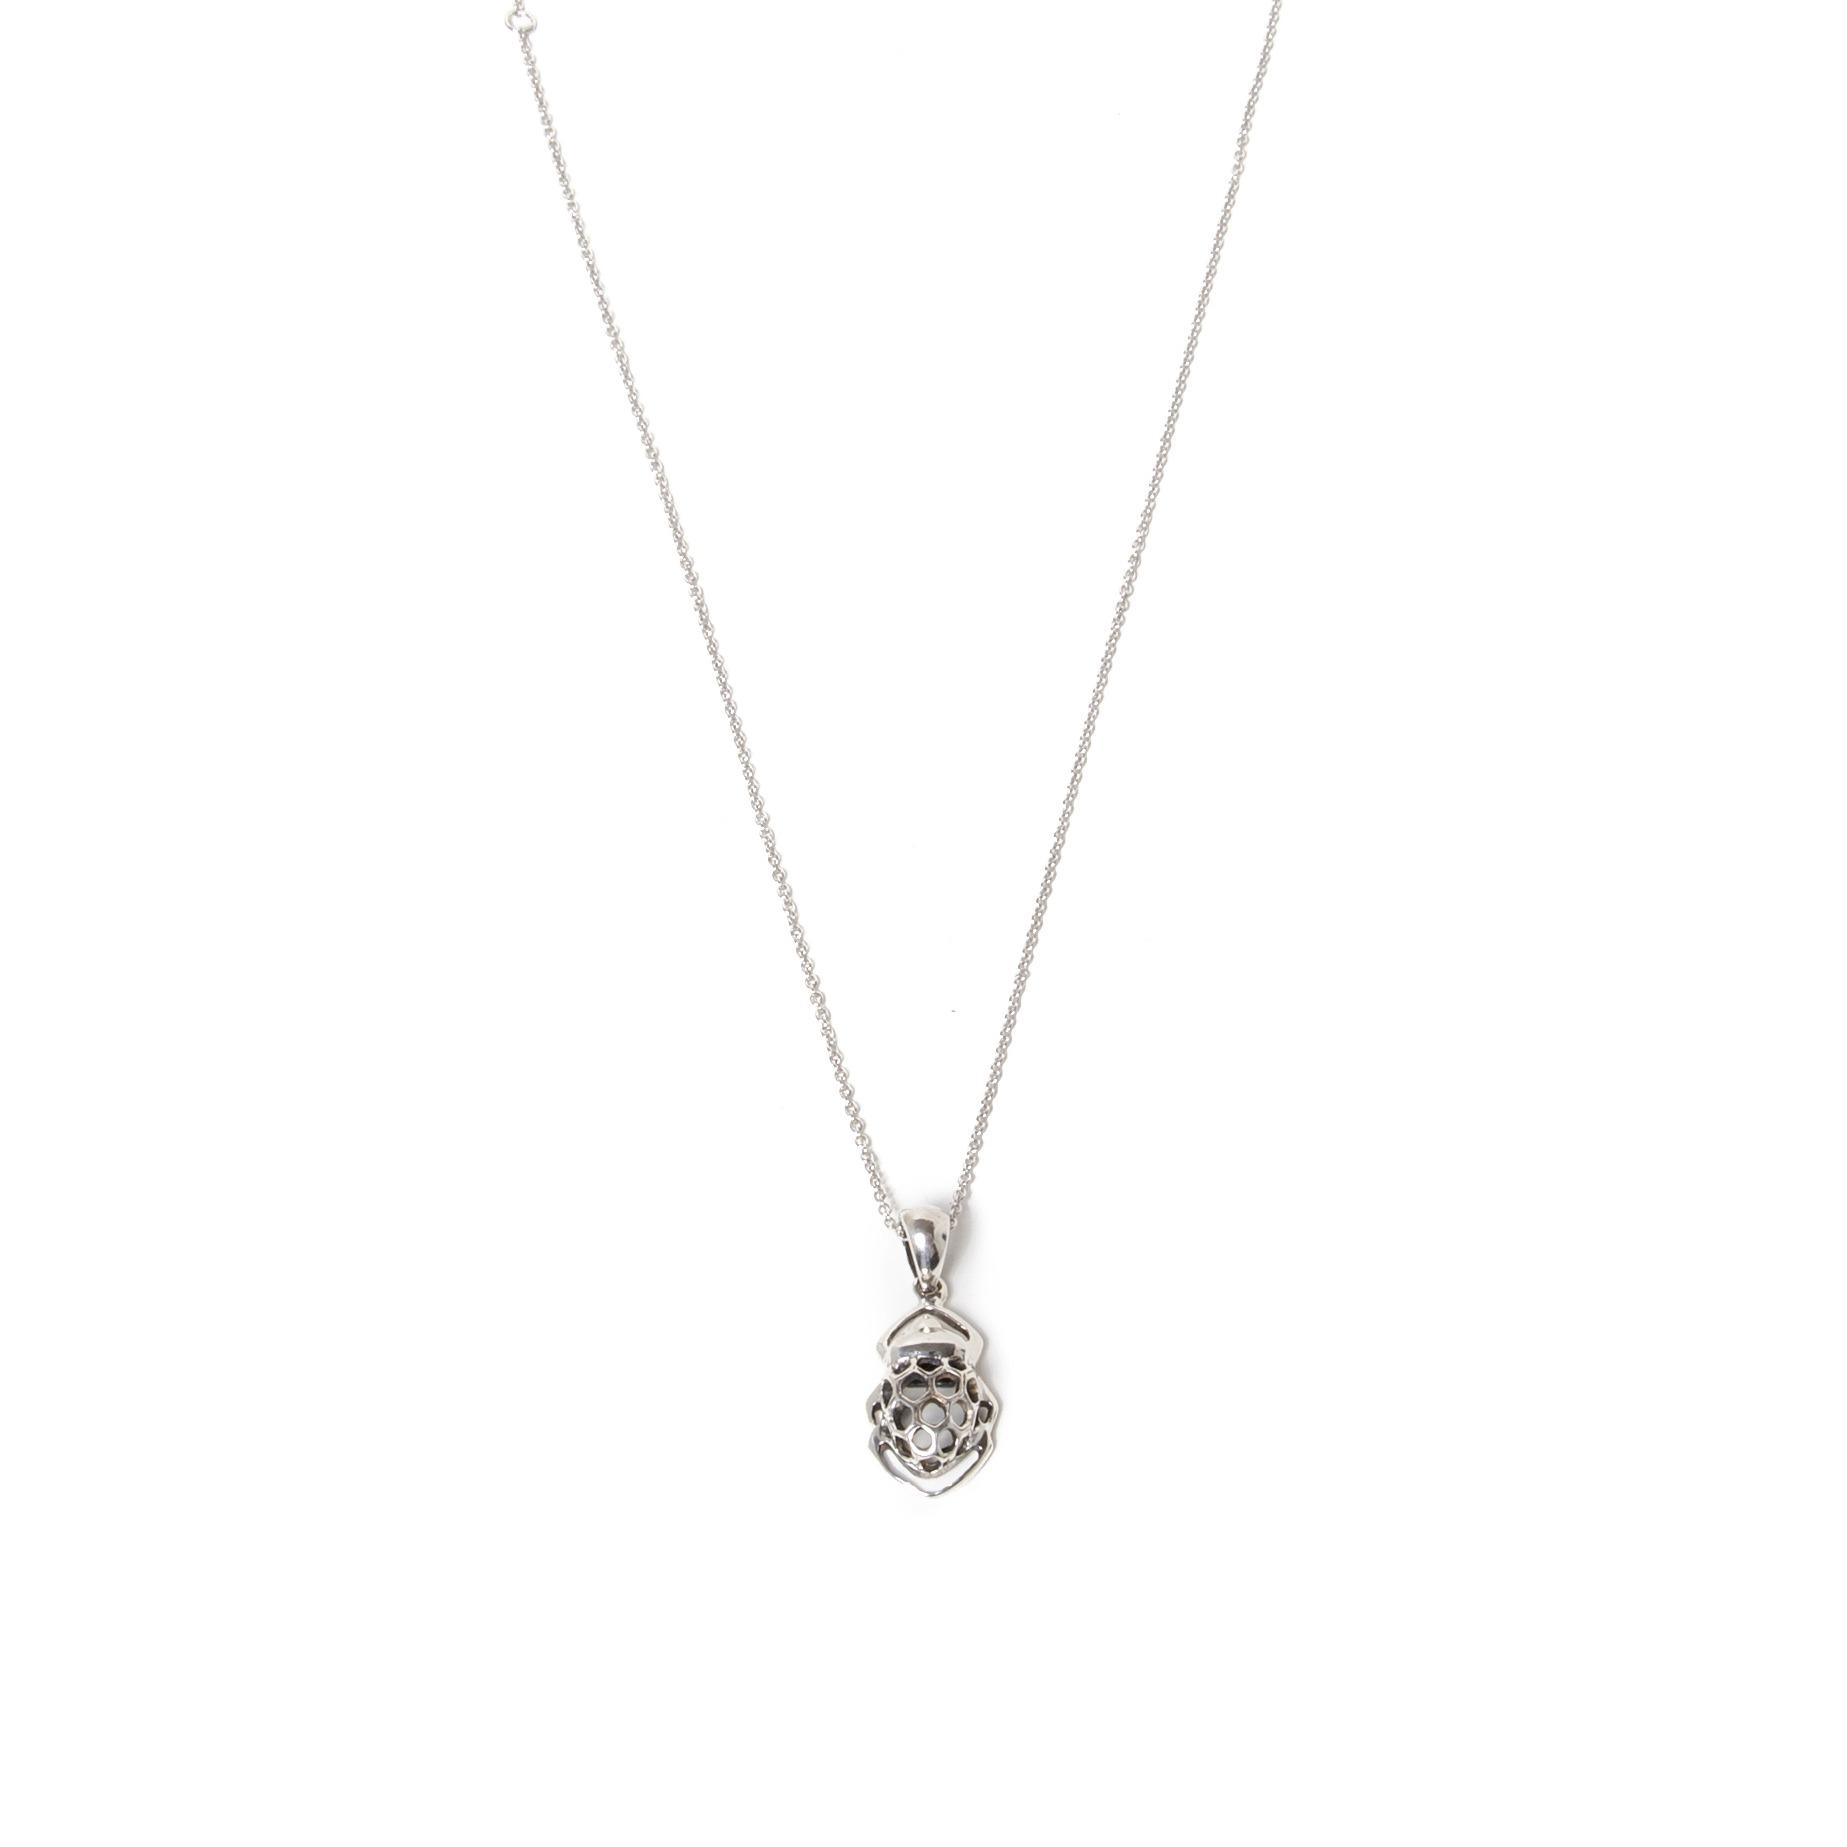 Pendentif Mellona en argent sterling des bijoux SCARO.